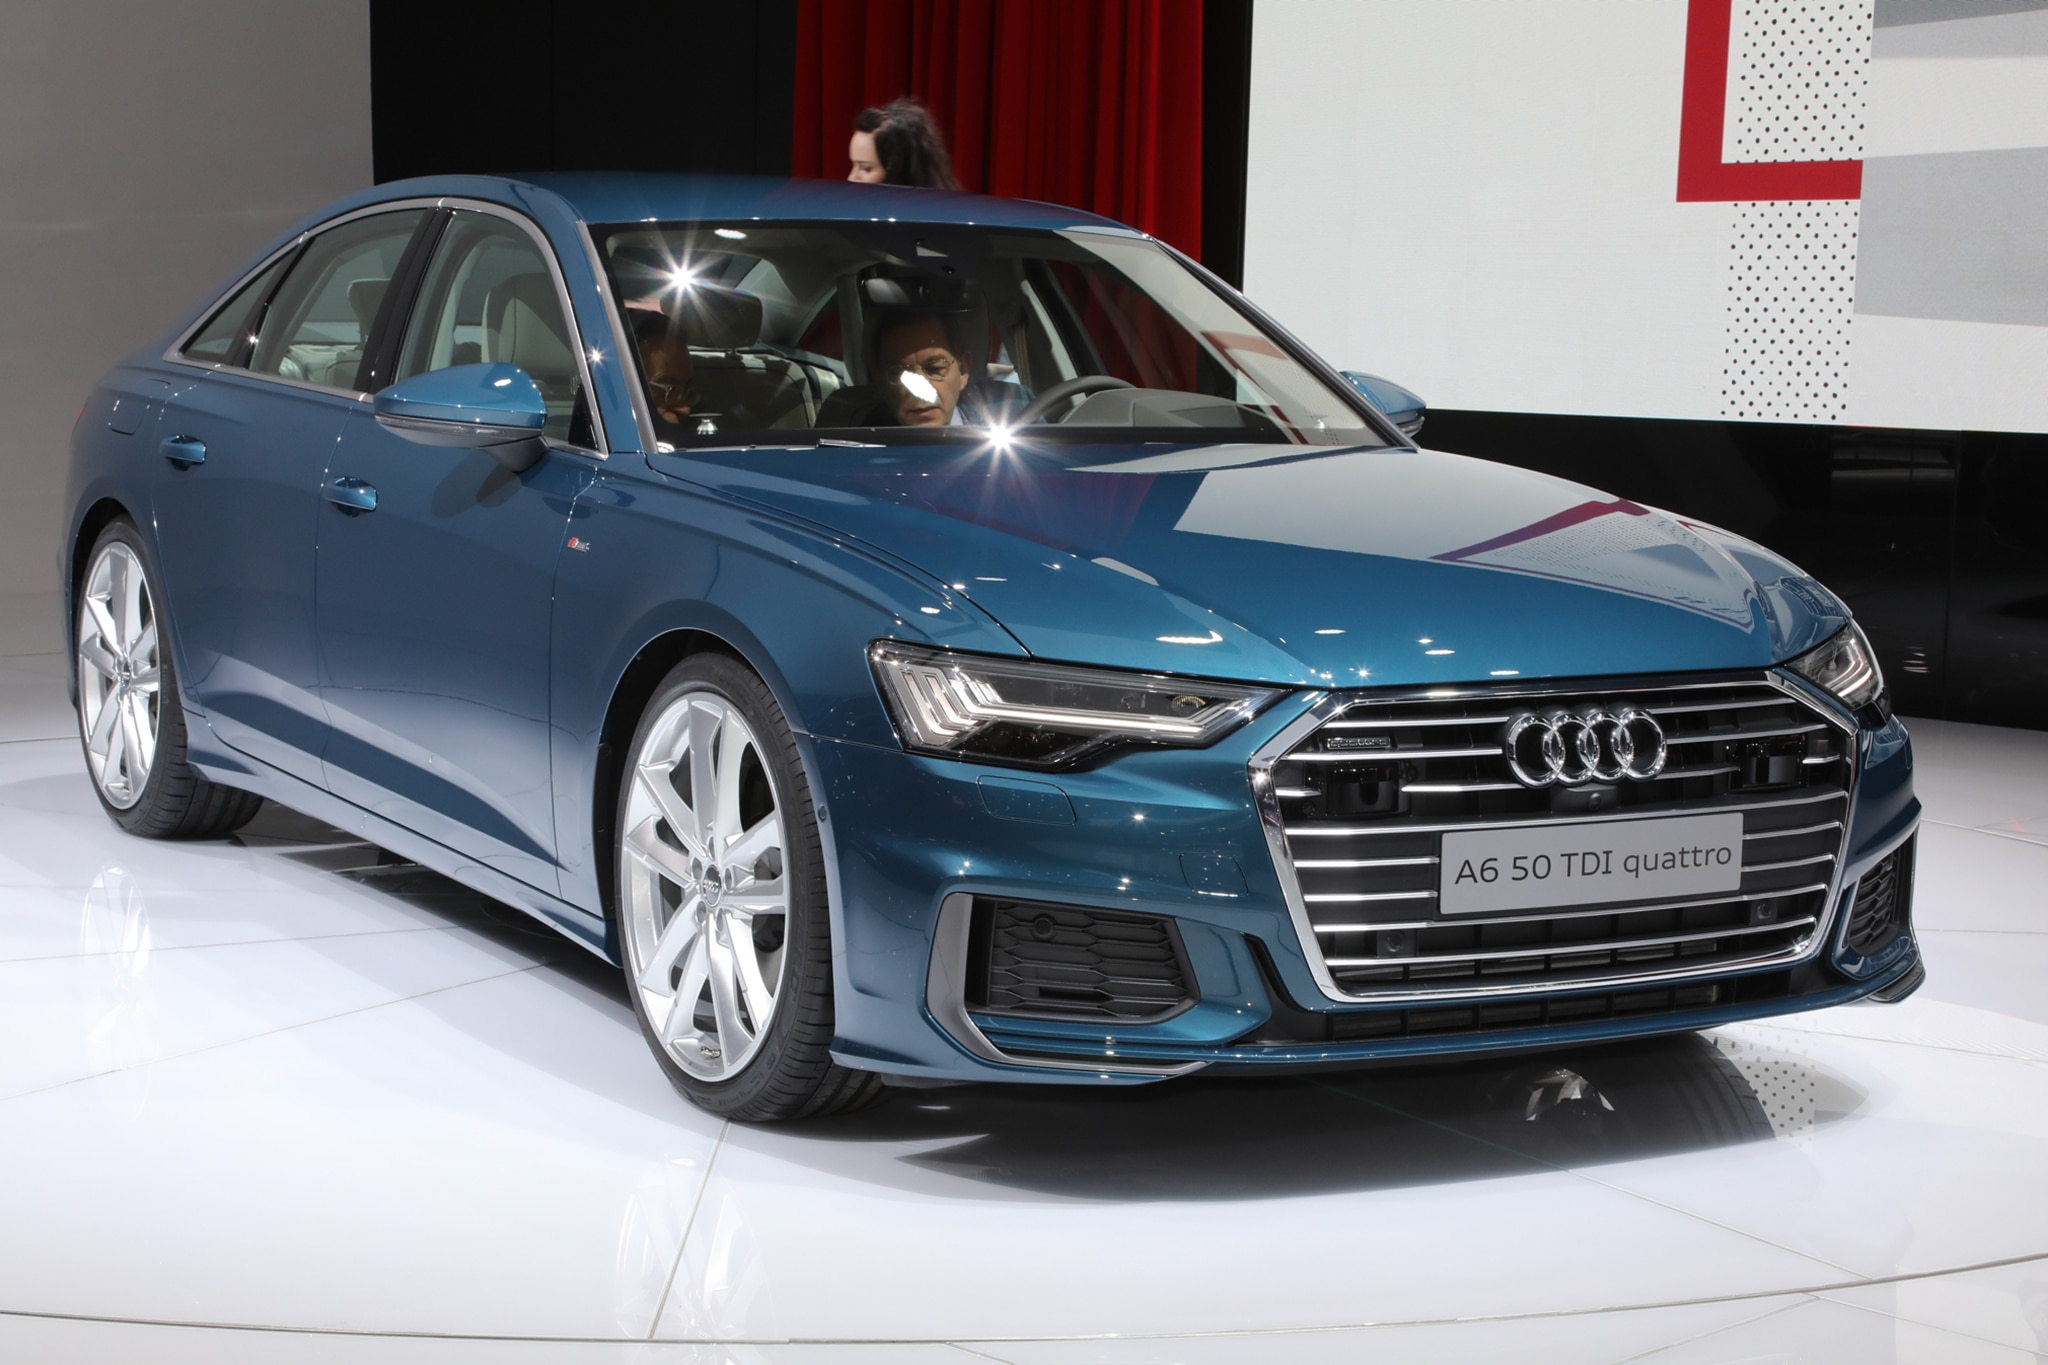 Best Photos of the 2018 Geneva Motor Show | Automobile ...